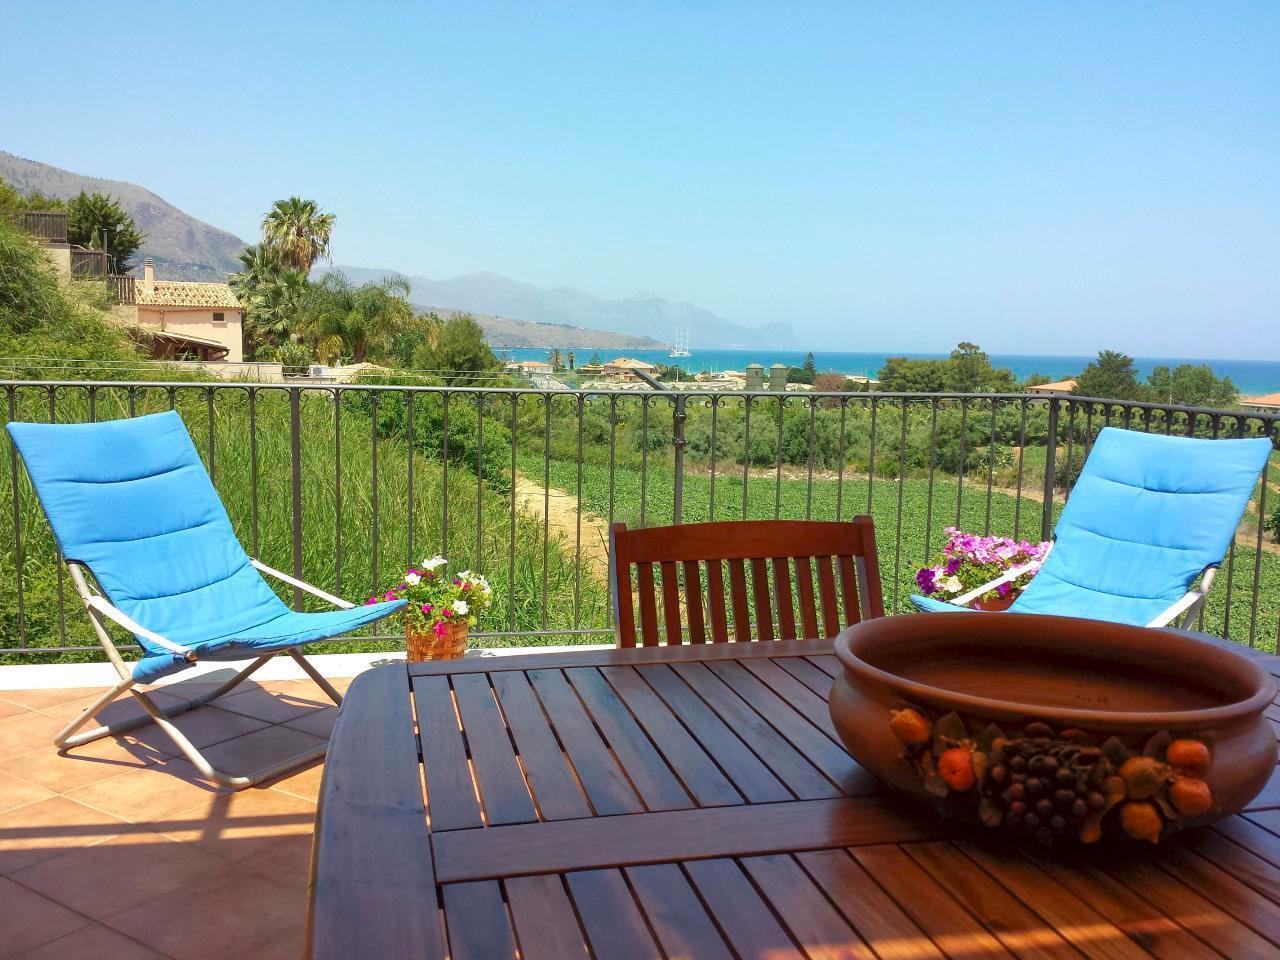 Maison de vacances Terraza Bella Vista - Garten - Wifi - 1 km vom Meer (1702639), Castellammare del Golfo, Trapani, Sicile, Italie, image 4